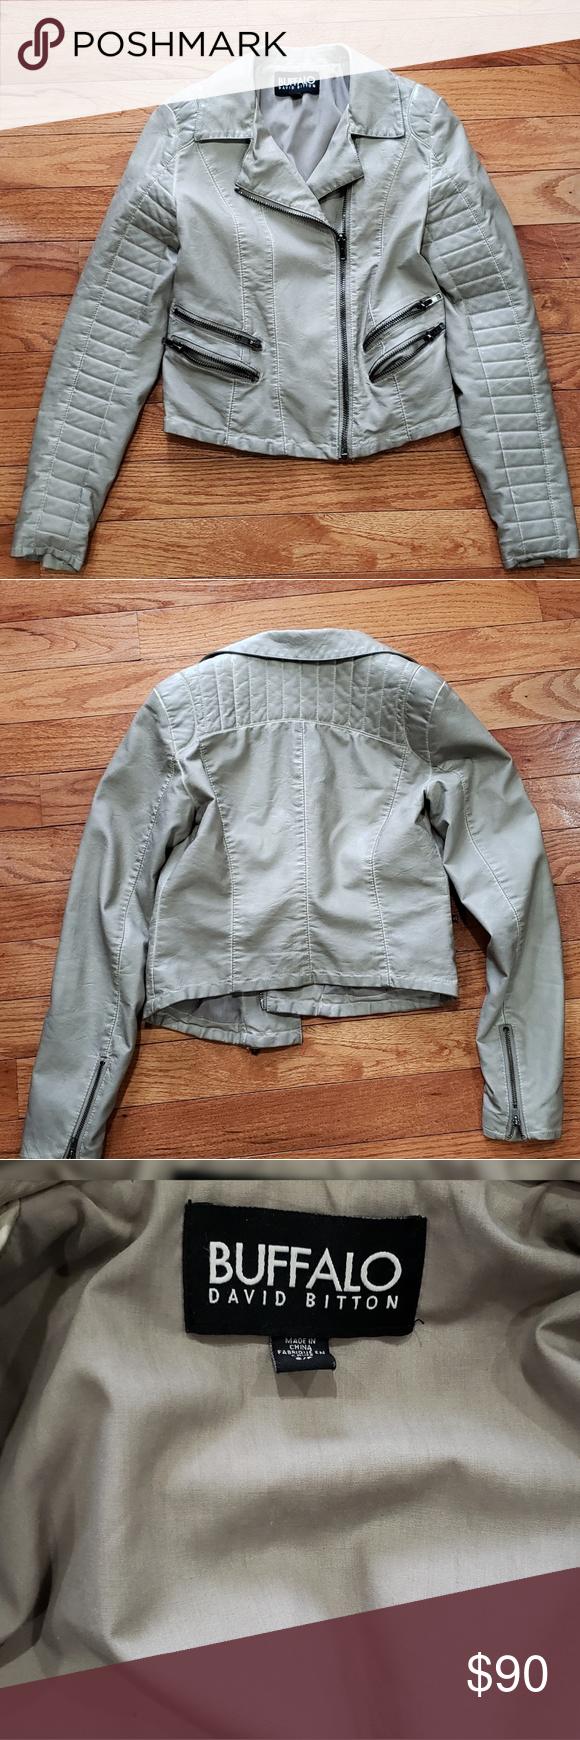 Buffalo David Bitton Silver Moto Jacket Silver Moto Jacket With Grey Hardware Full Length Like New No Rips Stains Fades Jackets Moto Jacket Clothes Design [ 1740 x 580 Pixel ]